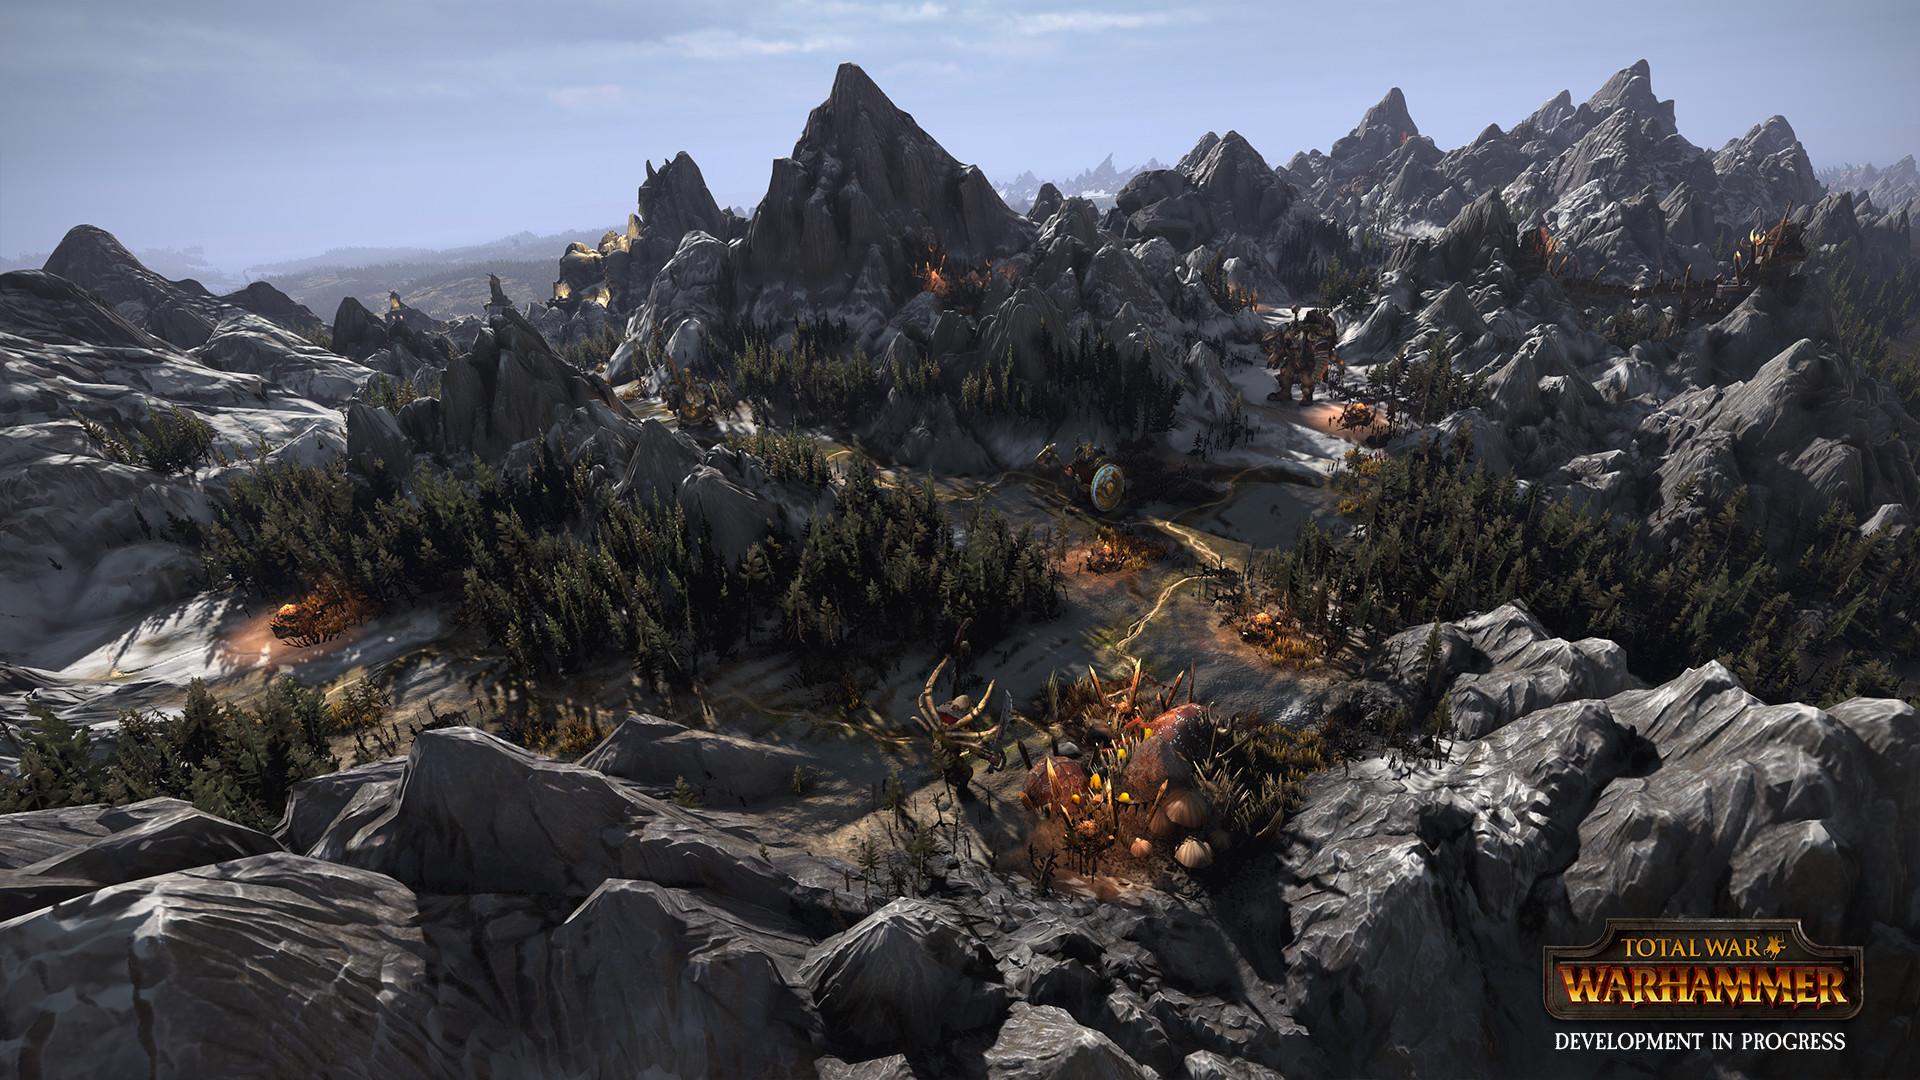 mod war in the world of magic era dragons скачать торрент